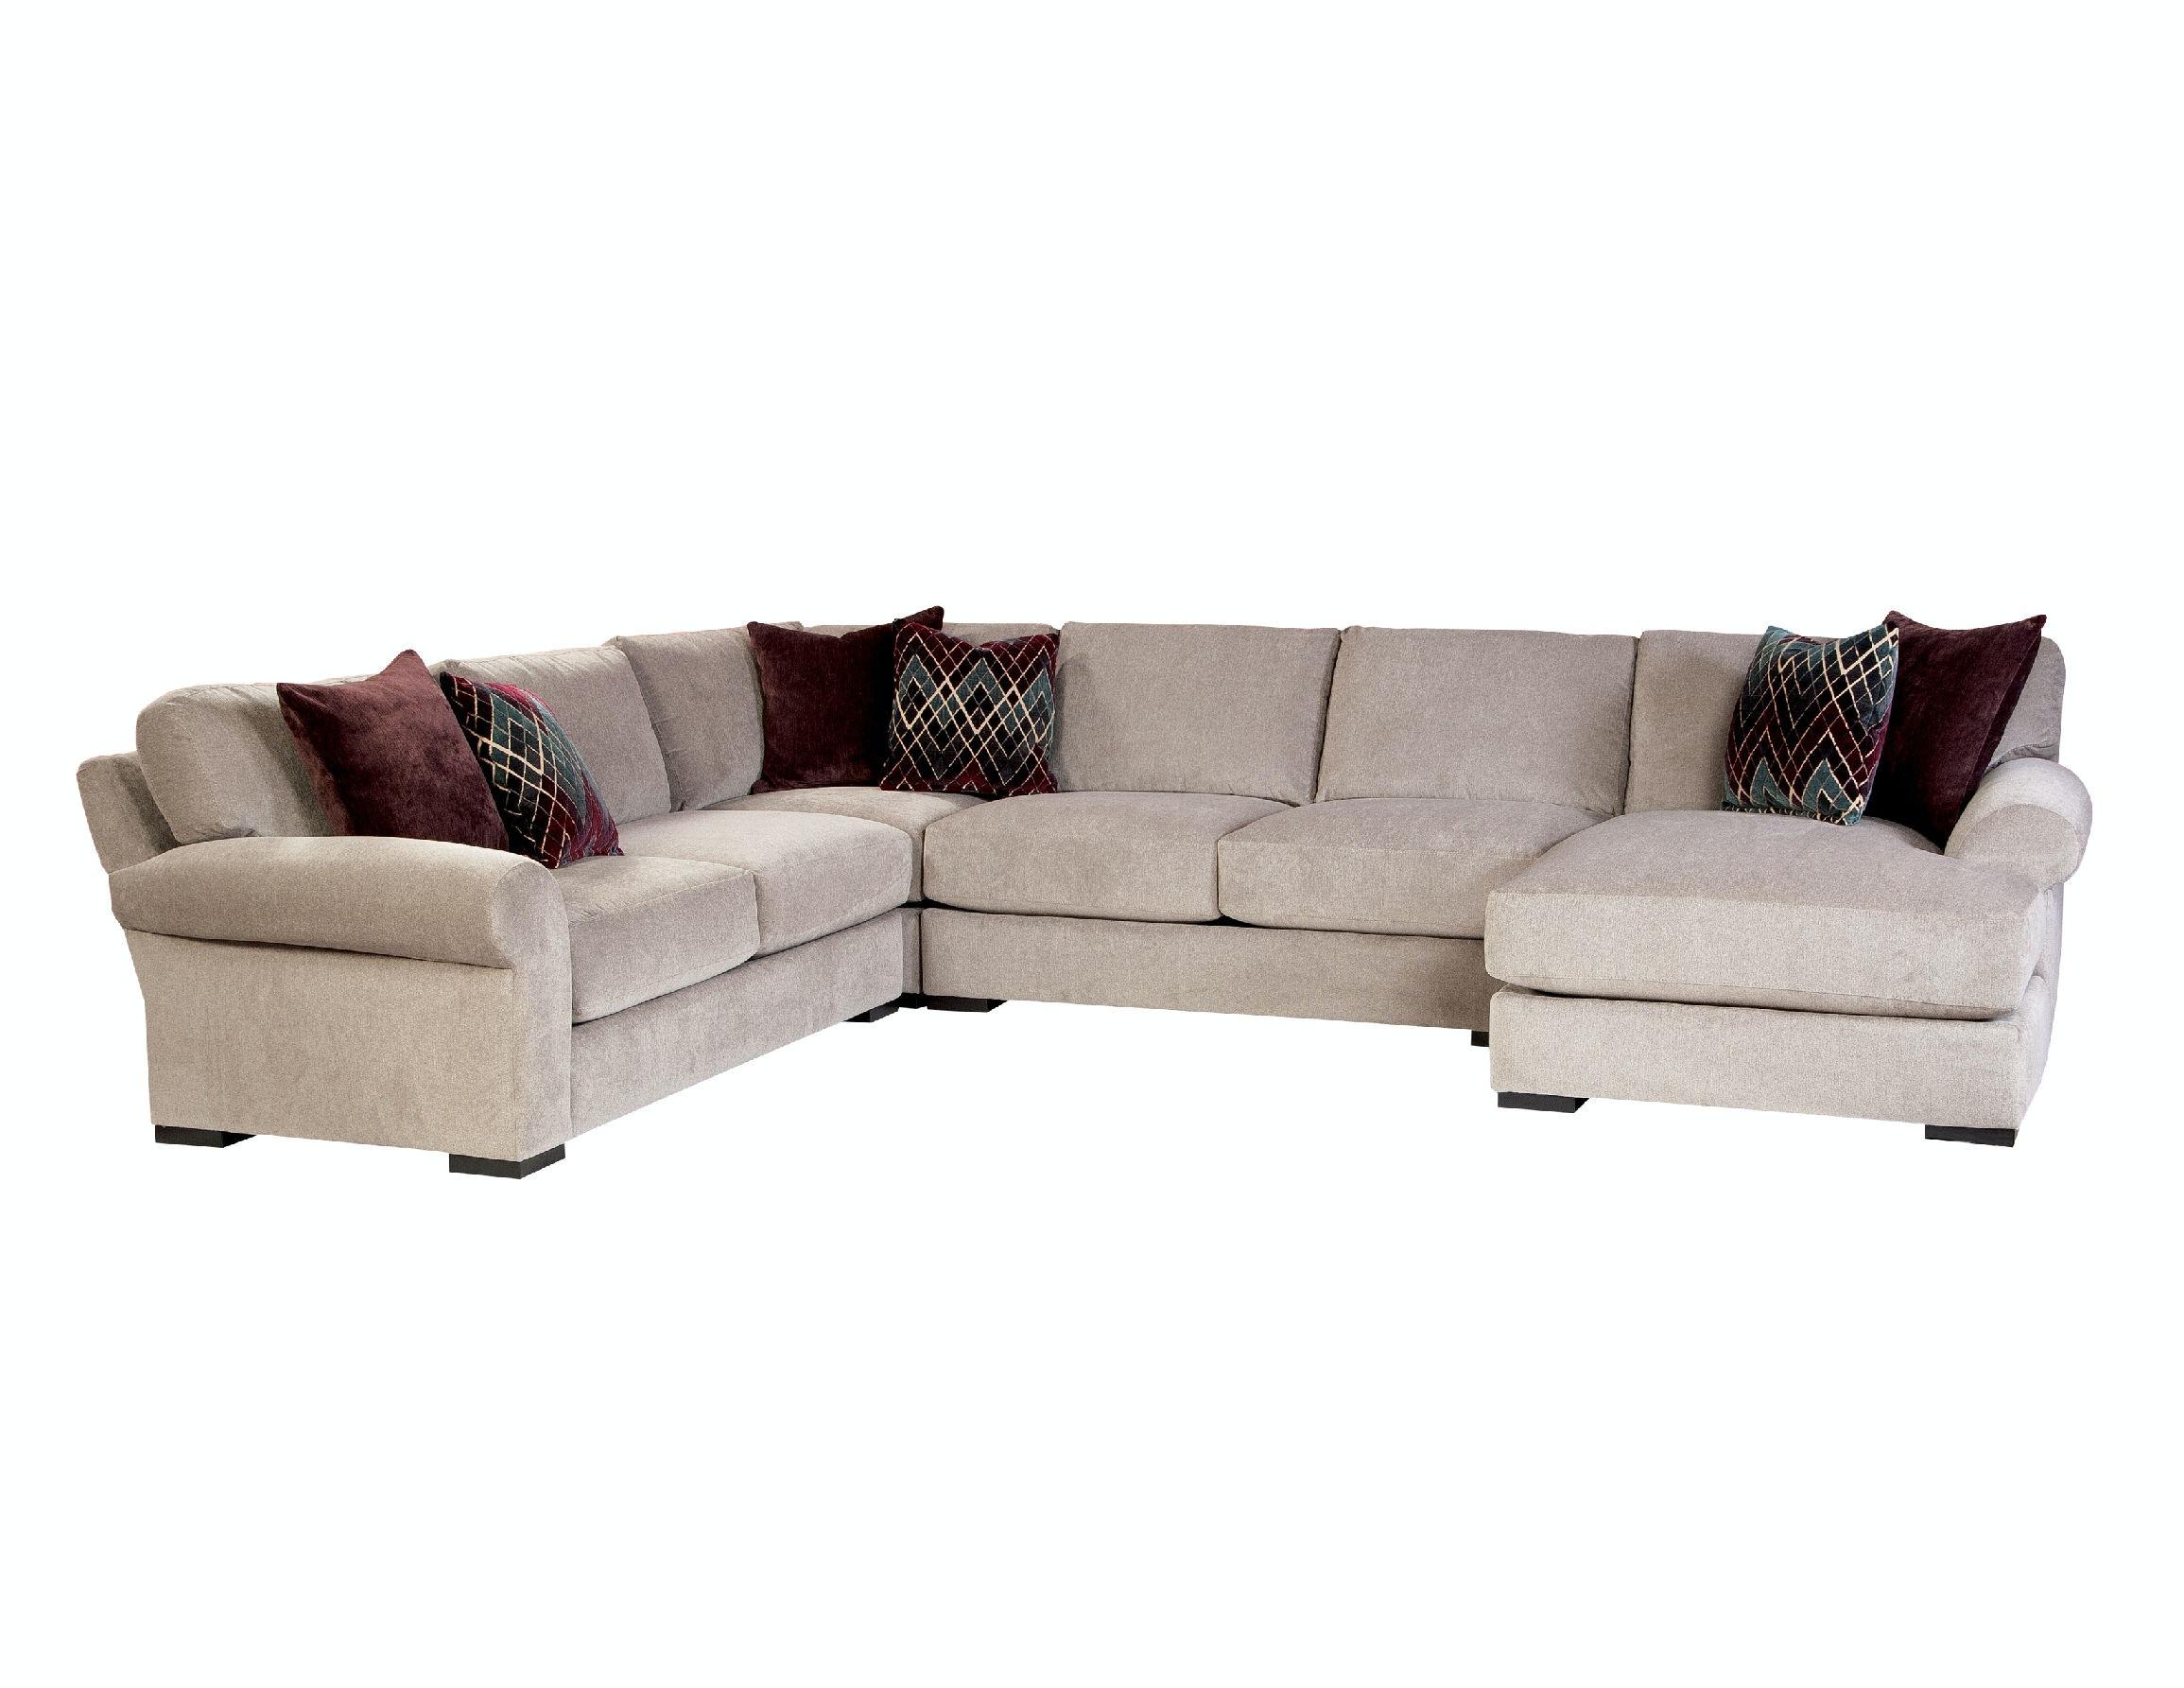 sectional sofa dallas fort worth custom sofas las vegas jonathan louis international living room elise